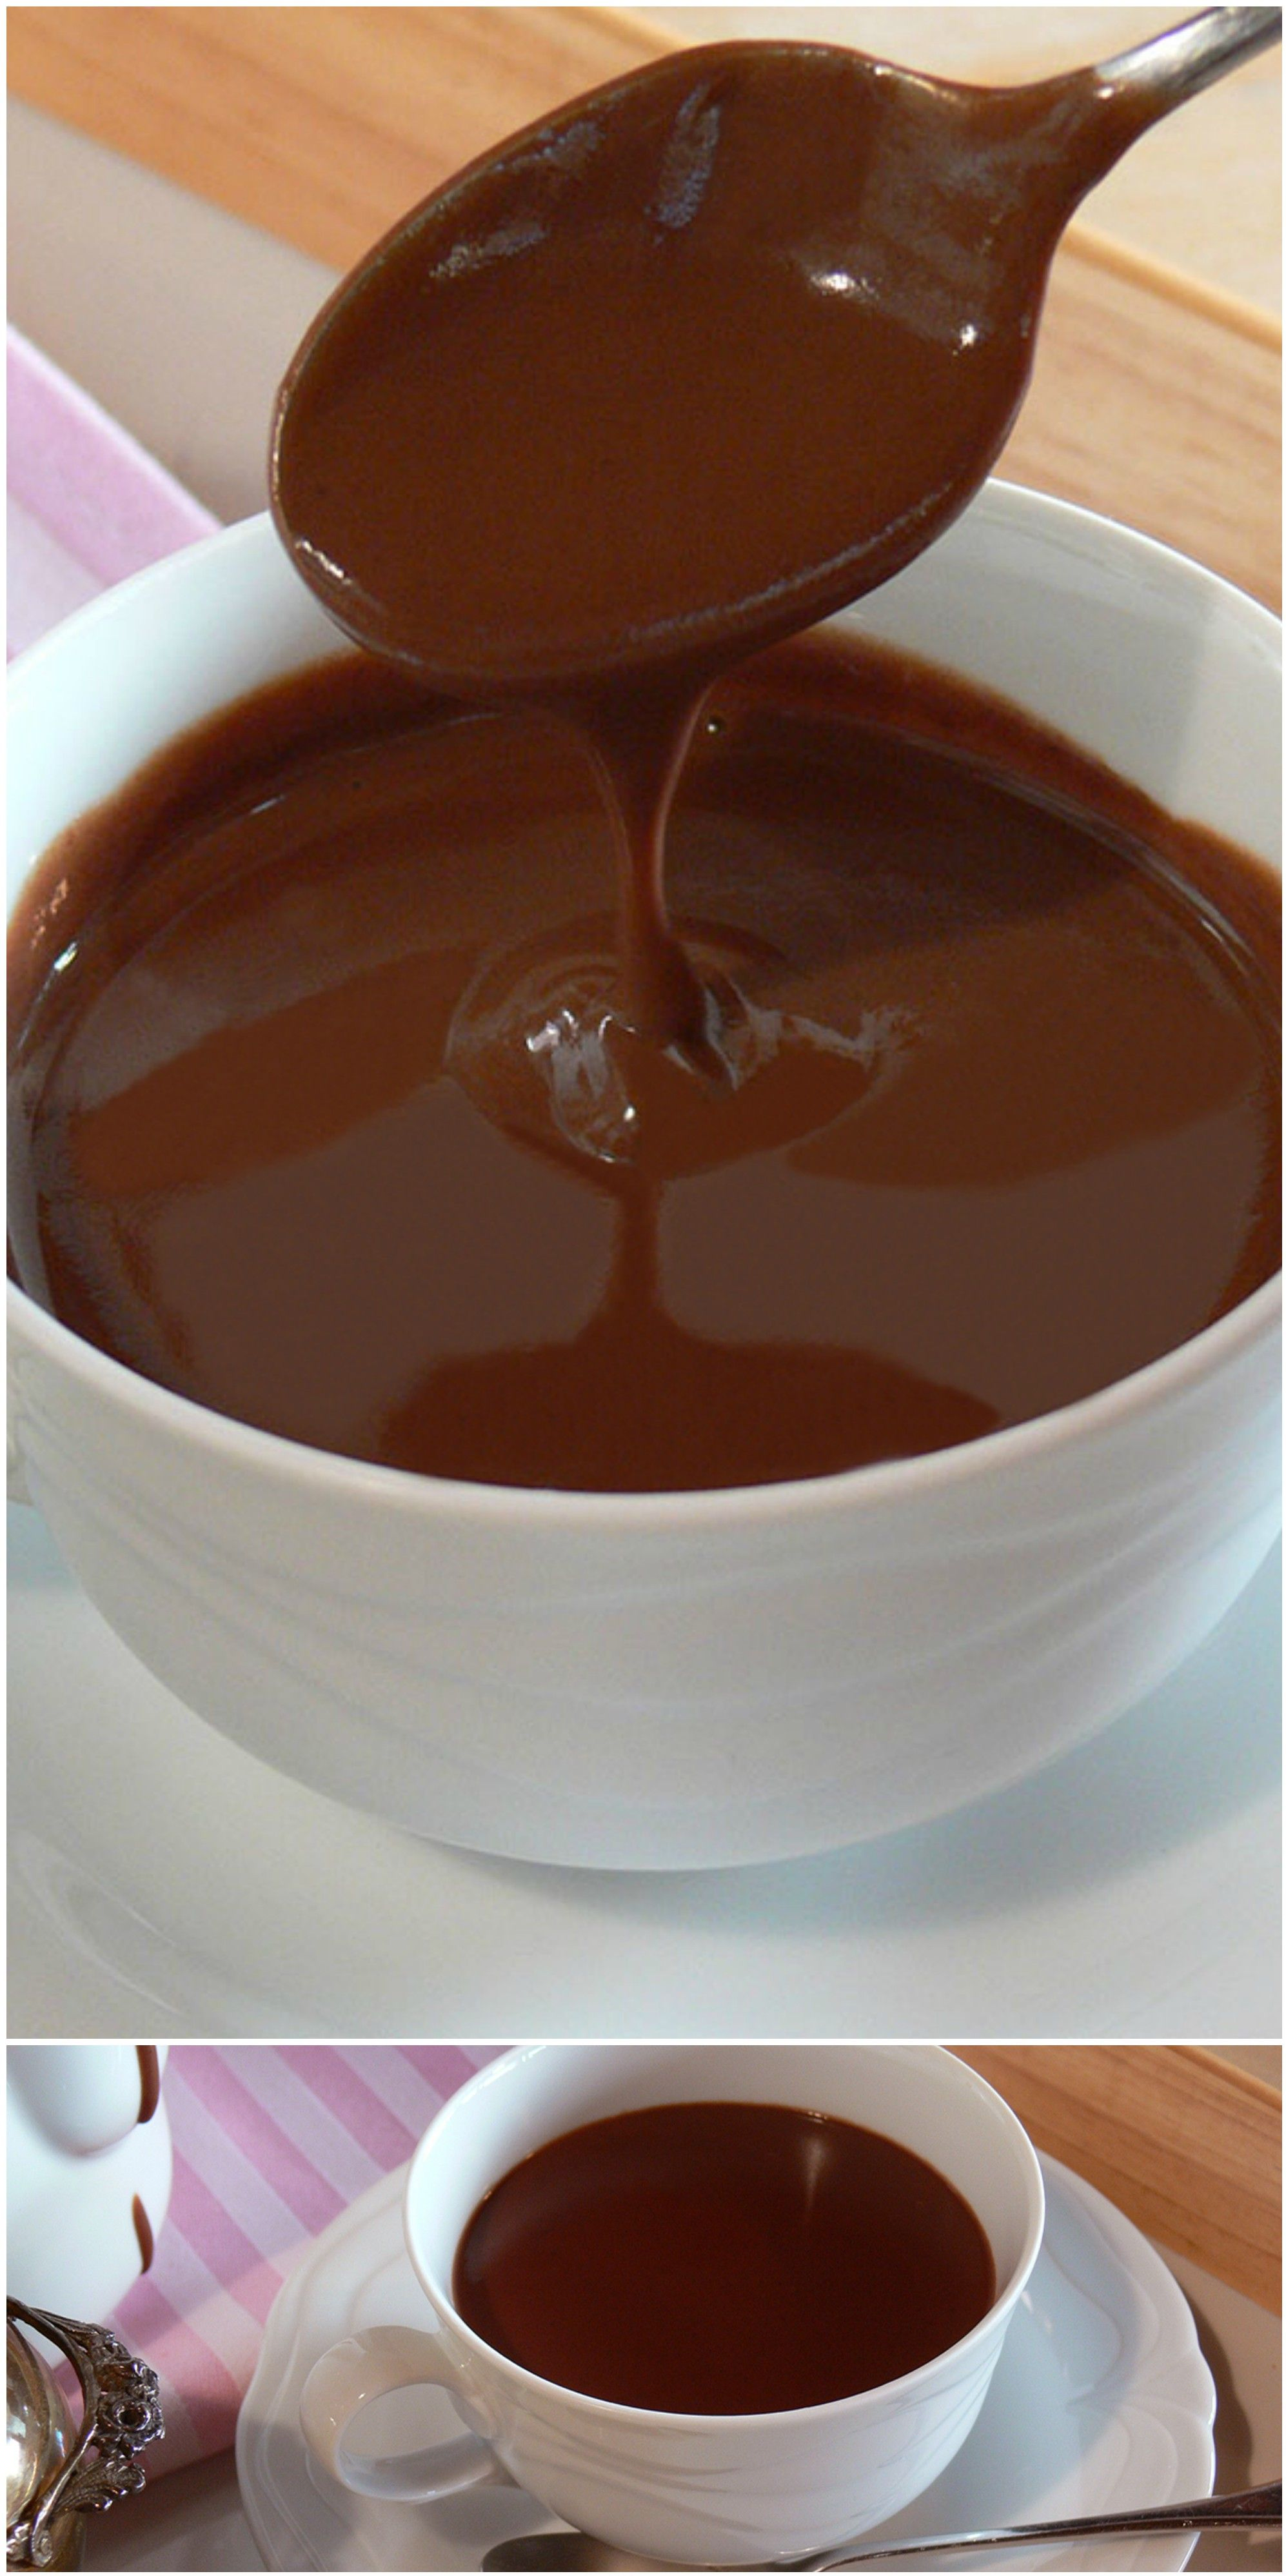 321e13dbe0221bd58d28e8fdb9d8c839 - Ricette Cioccolata